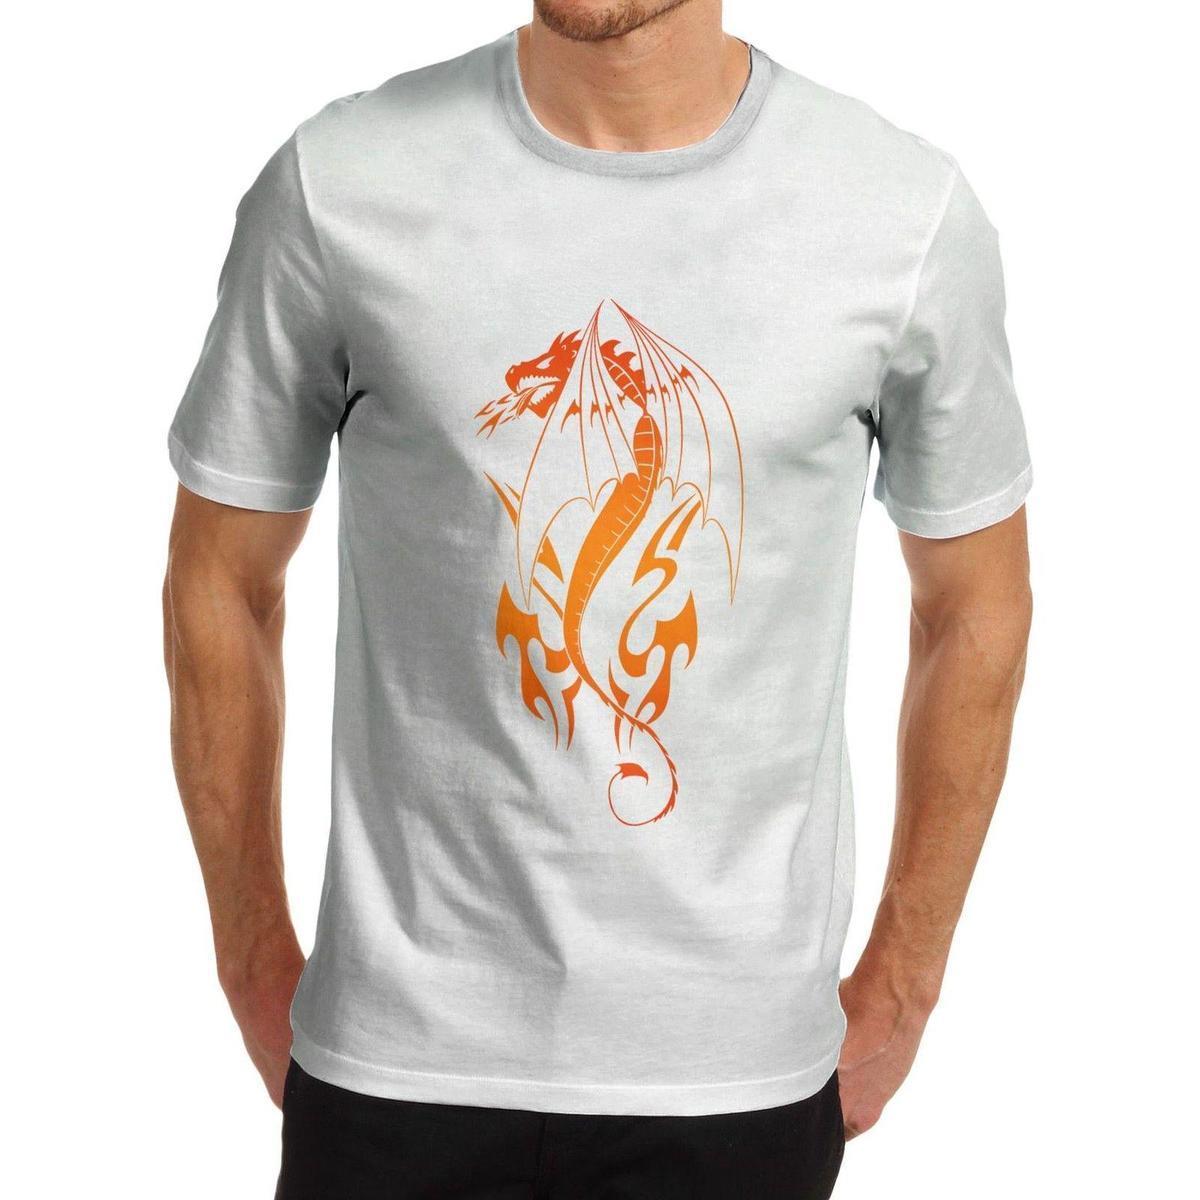 c23e8e932 Men'S Tribal Dragon Tattoo Design Printed T Shirt Awesome T Shirt Design  Shirt And Tshirt From Lijian51, $12.08| DHgate.Com